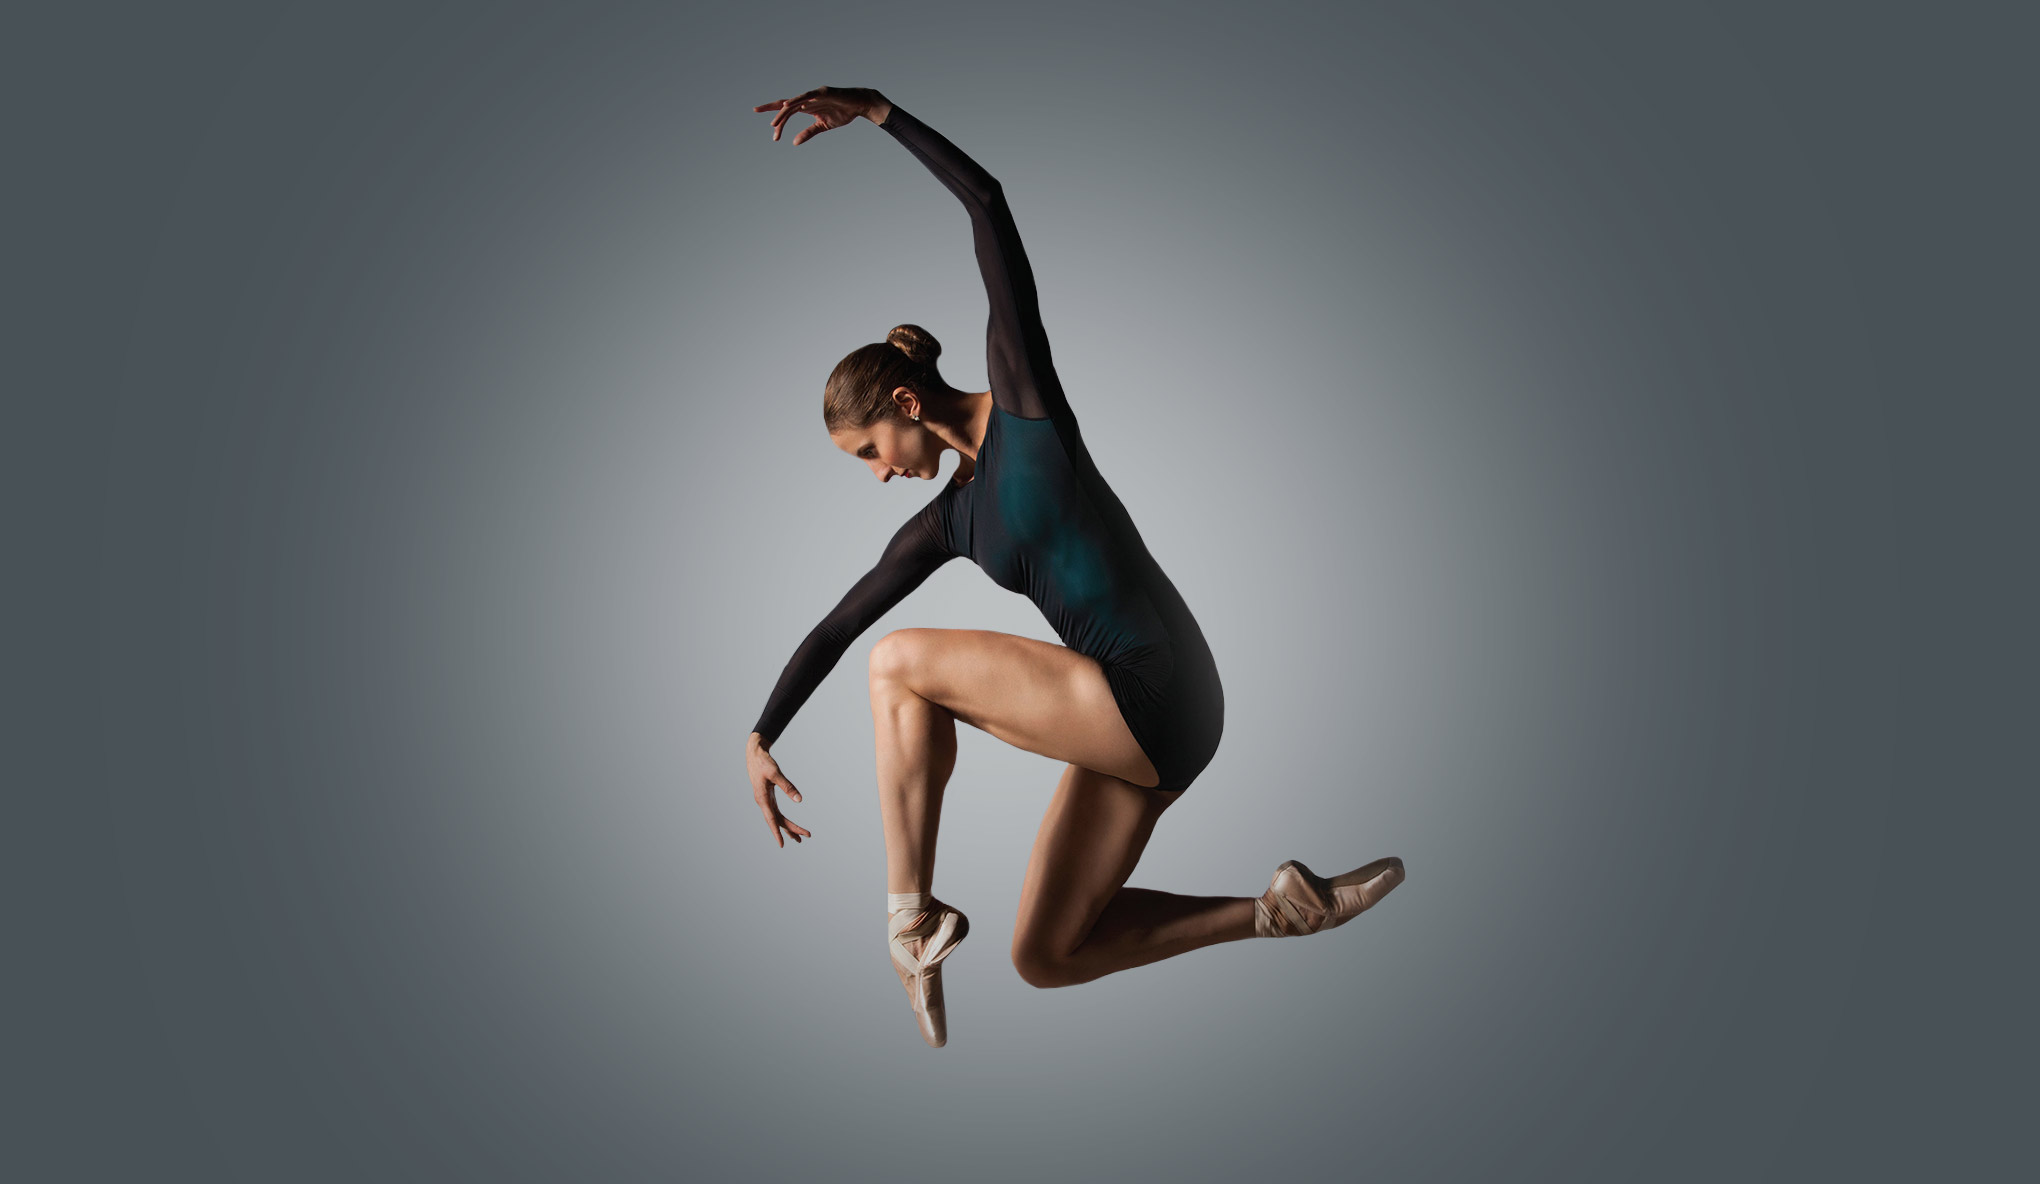 gymnastics-women-muge-b.jpg